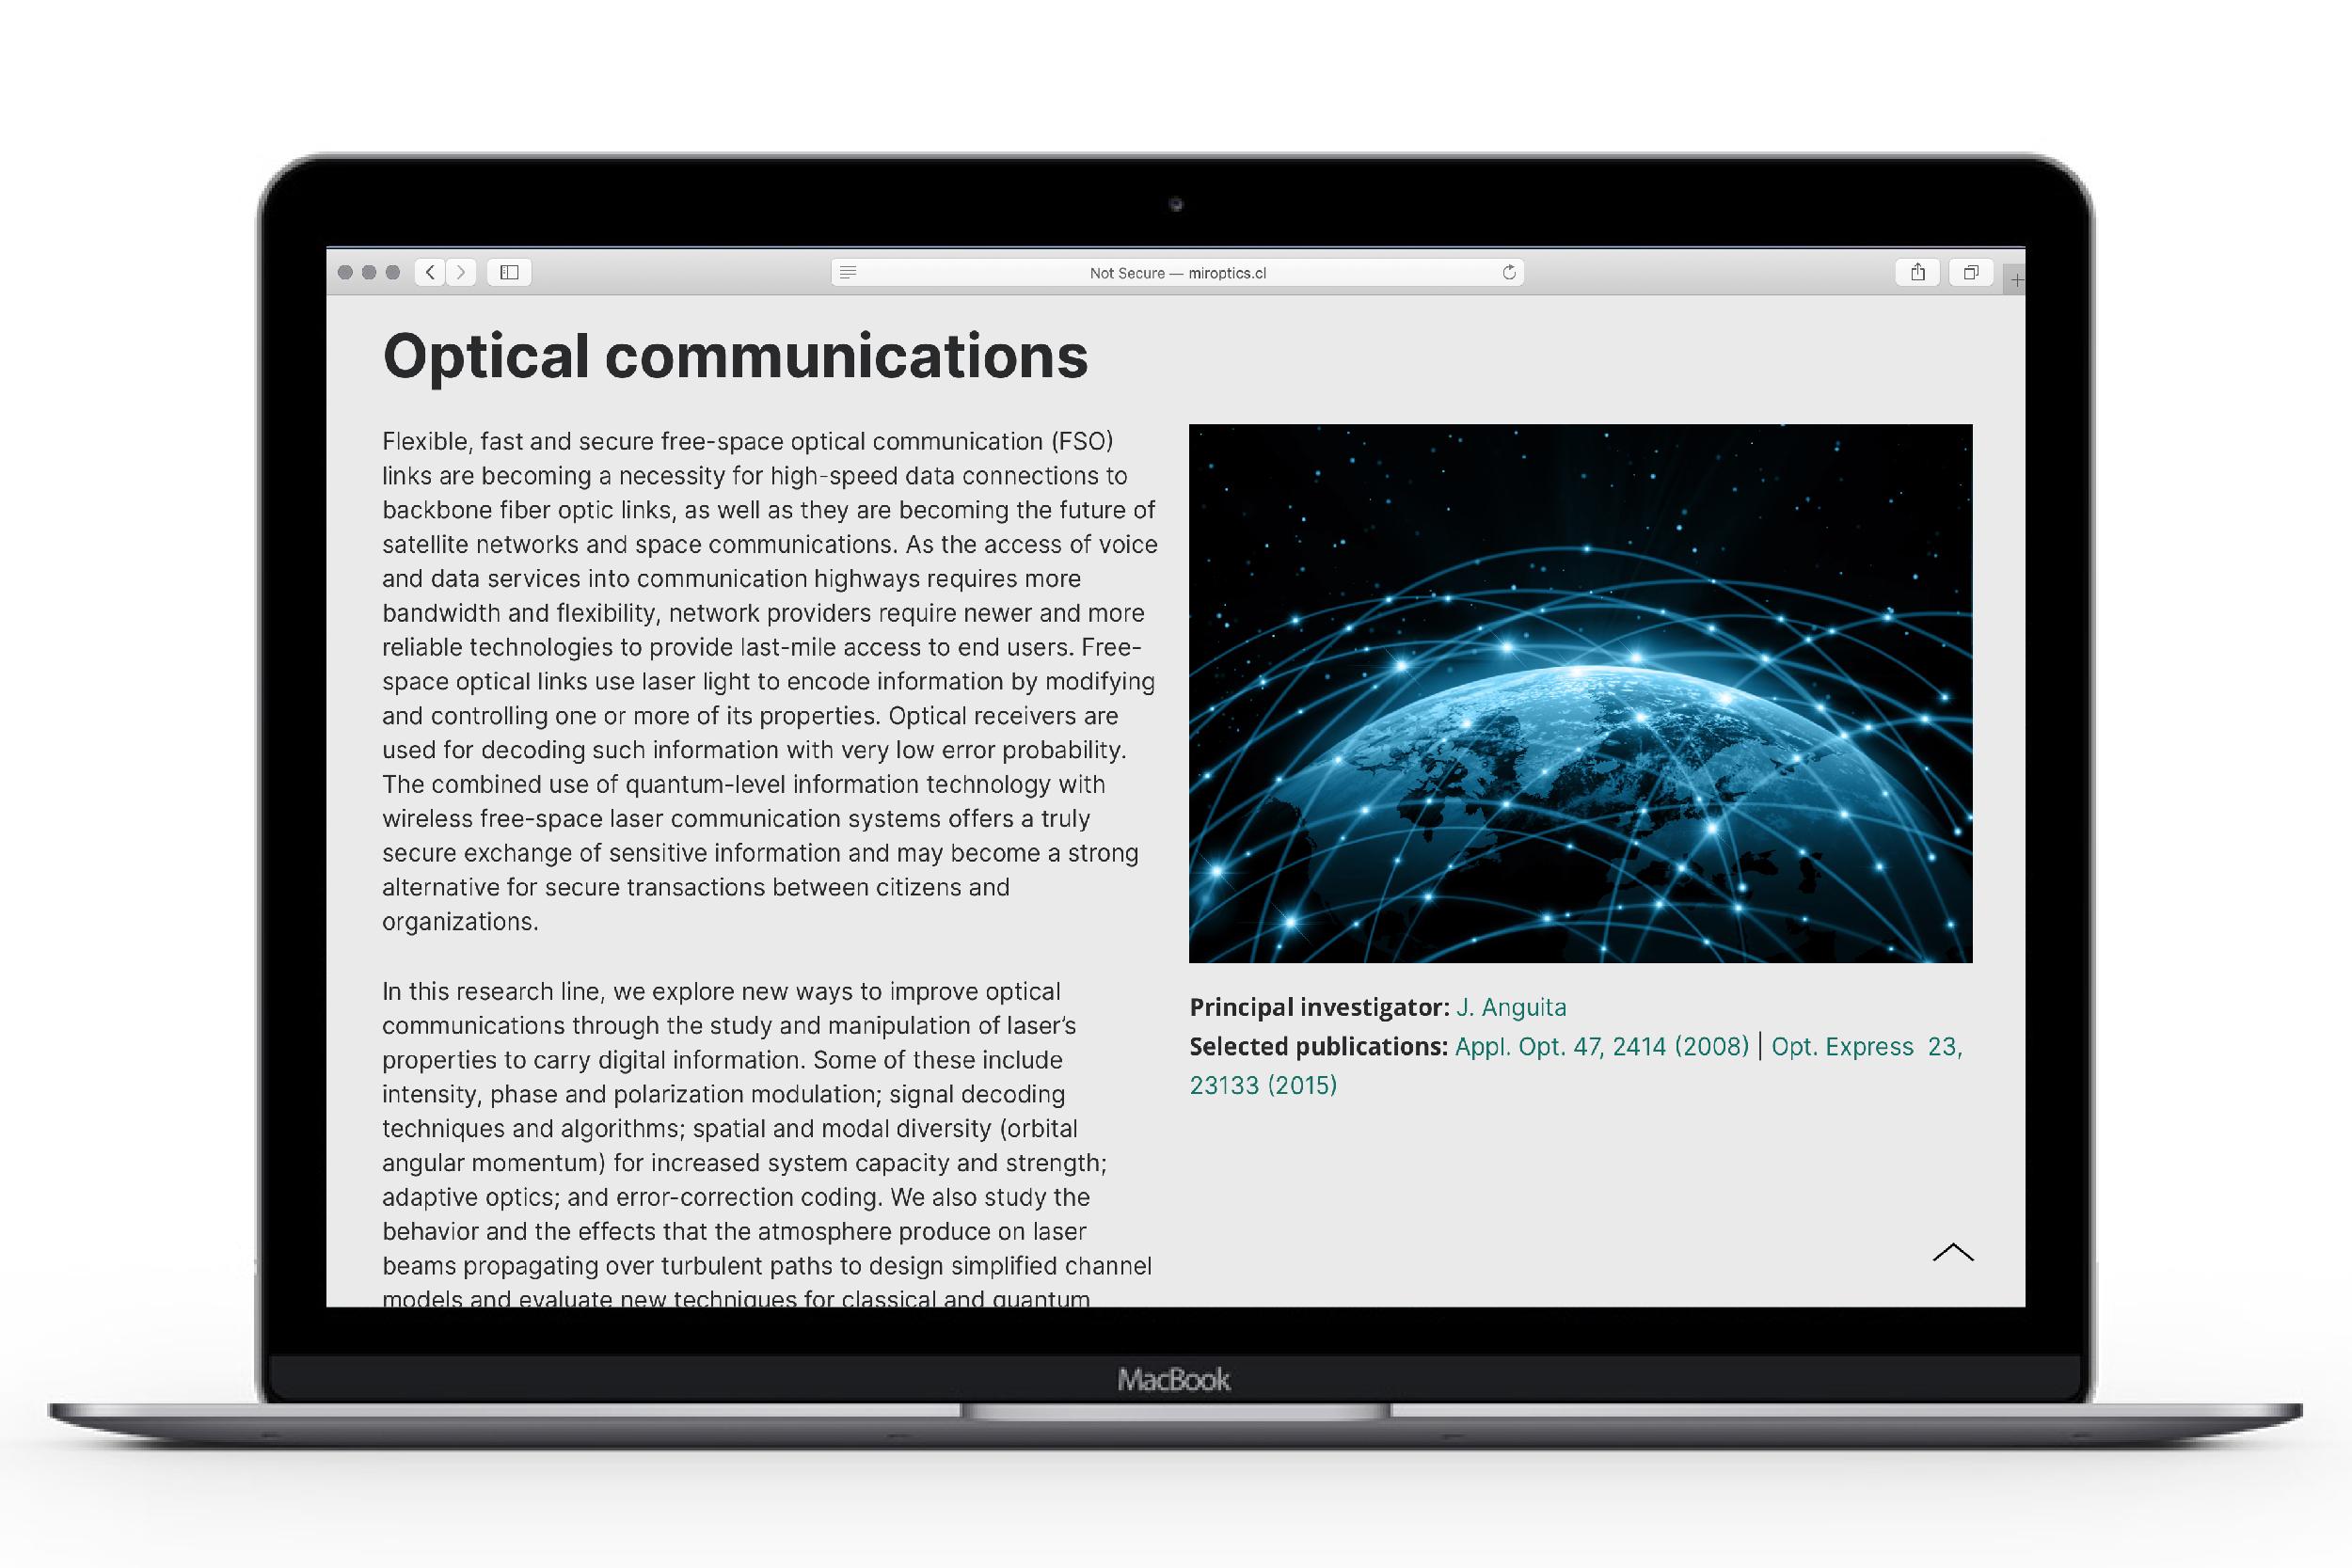 Bitflow-studio-miro-web-design-research-institute-6